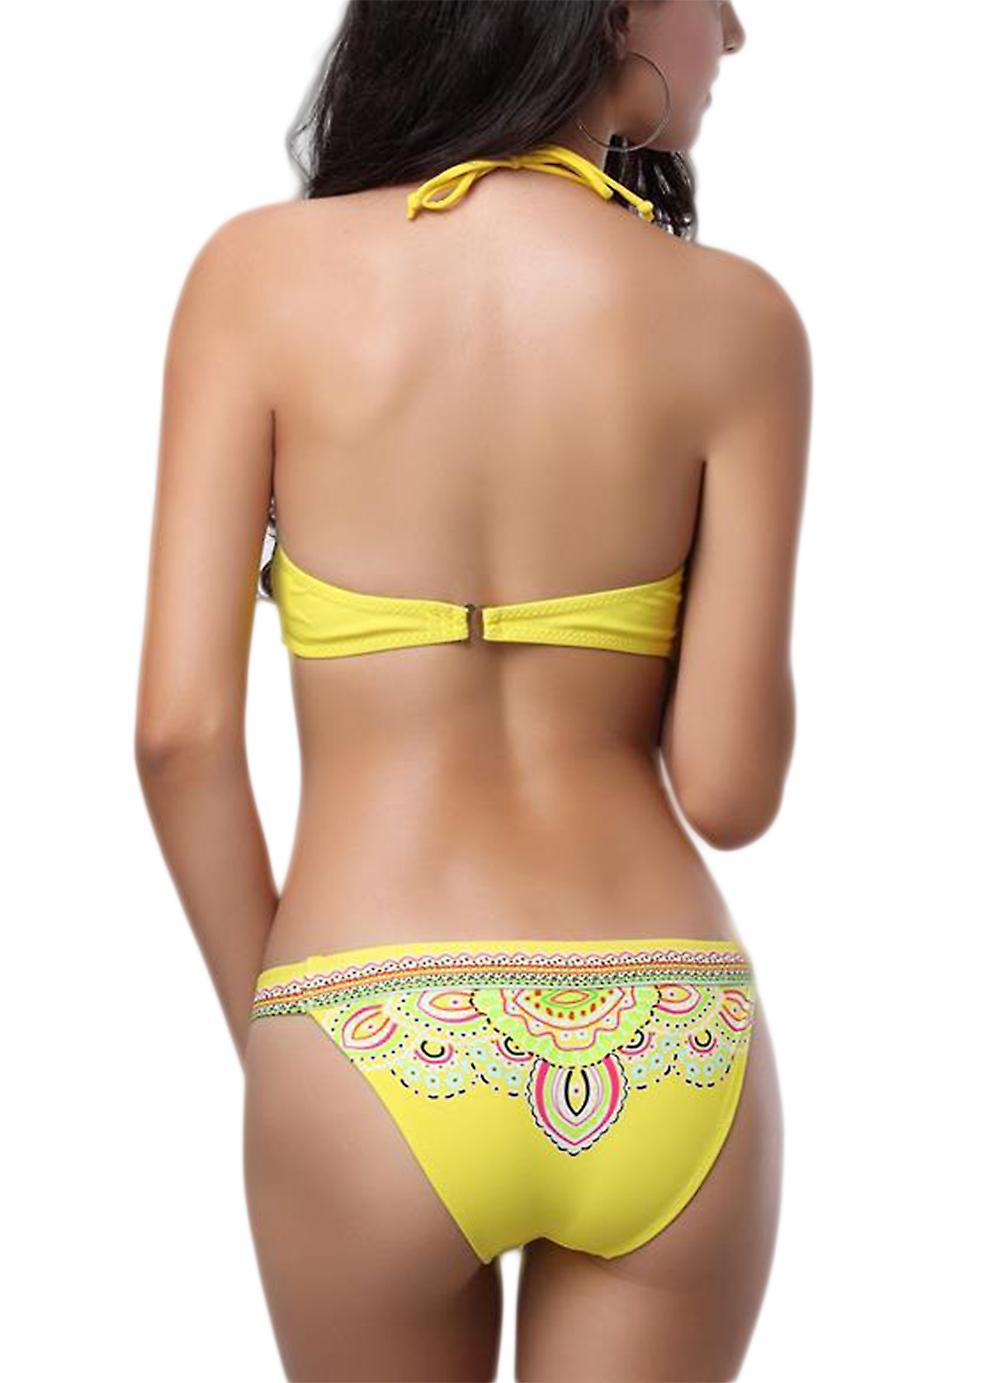 Waooh - Bikini marken mexikanska Breval